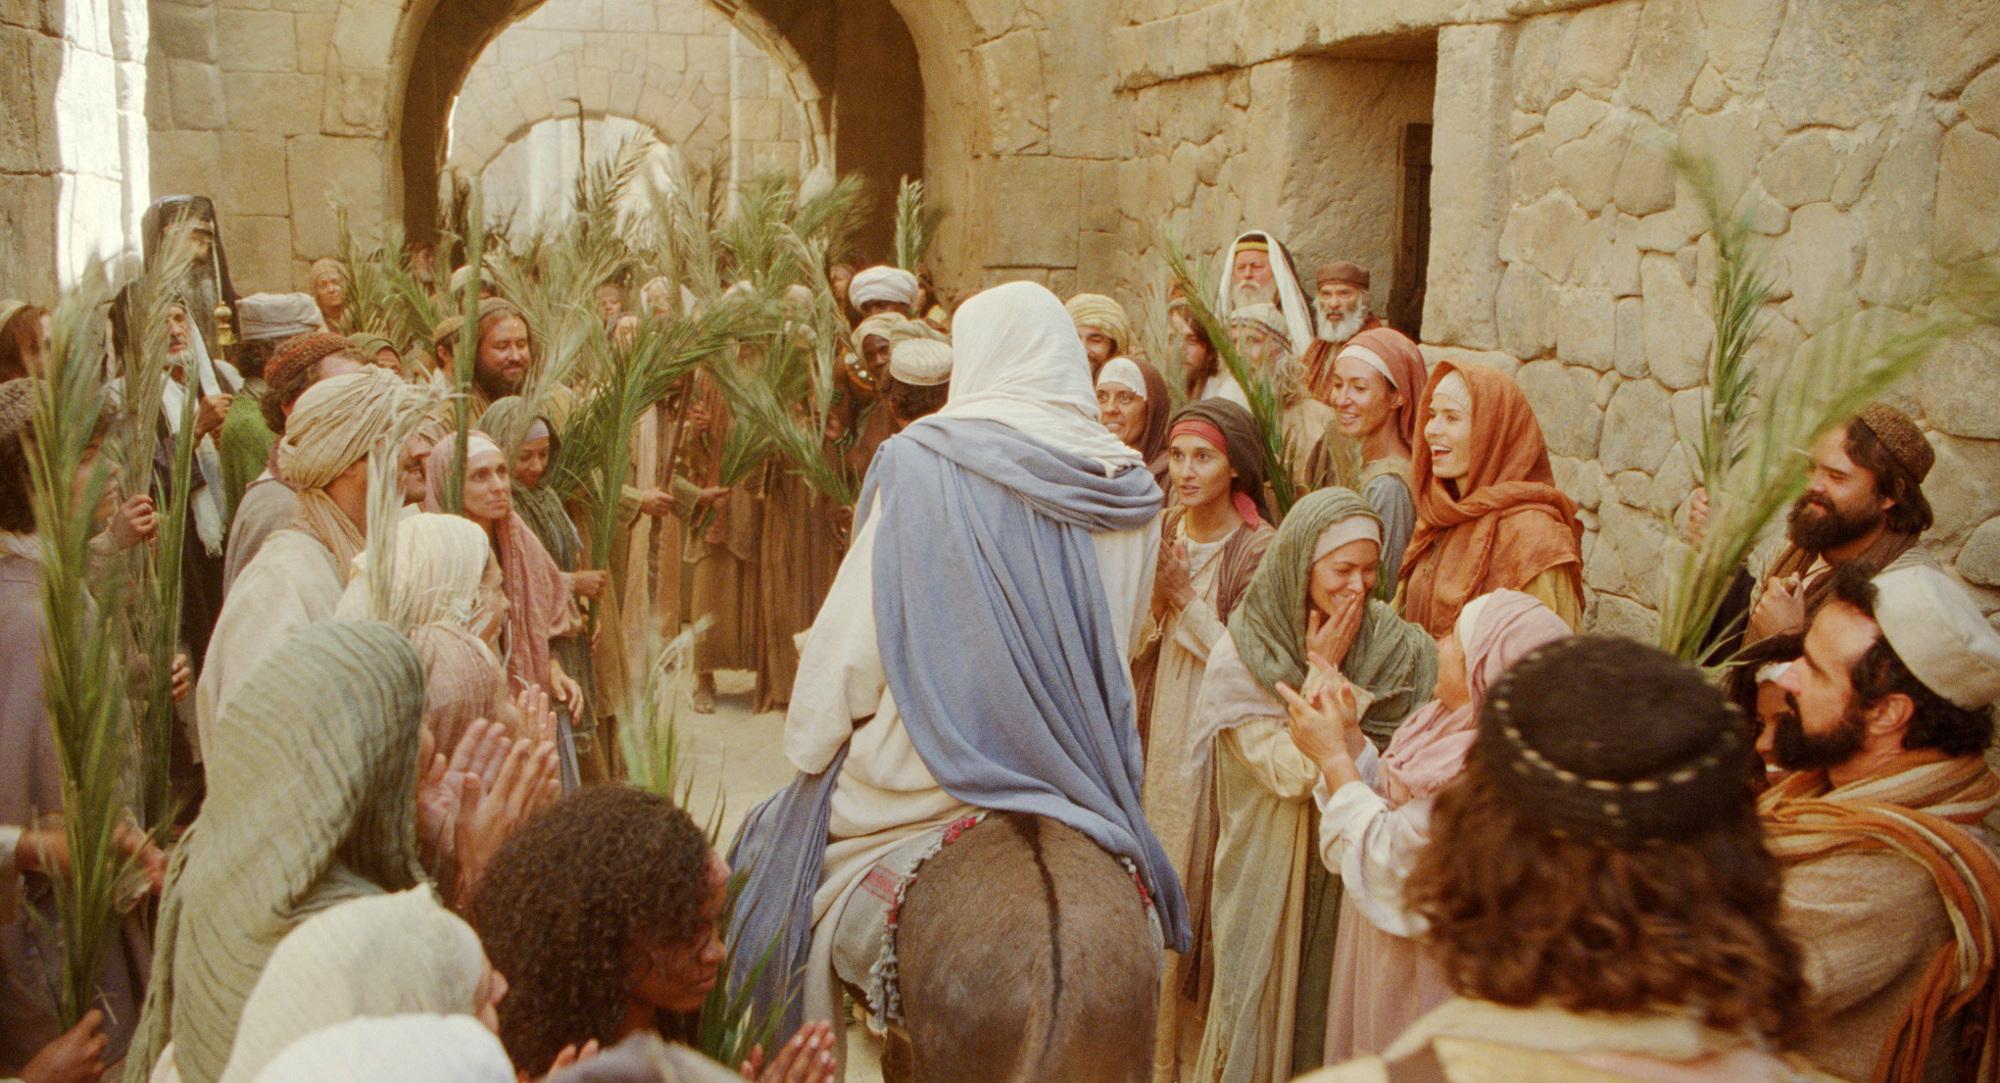 территории иисус в иерусалиме картинка след